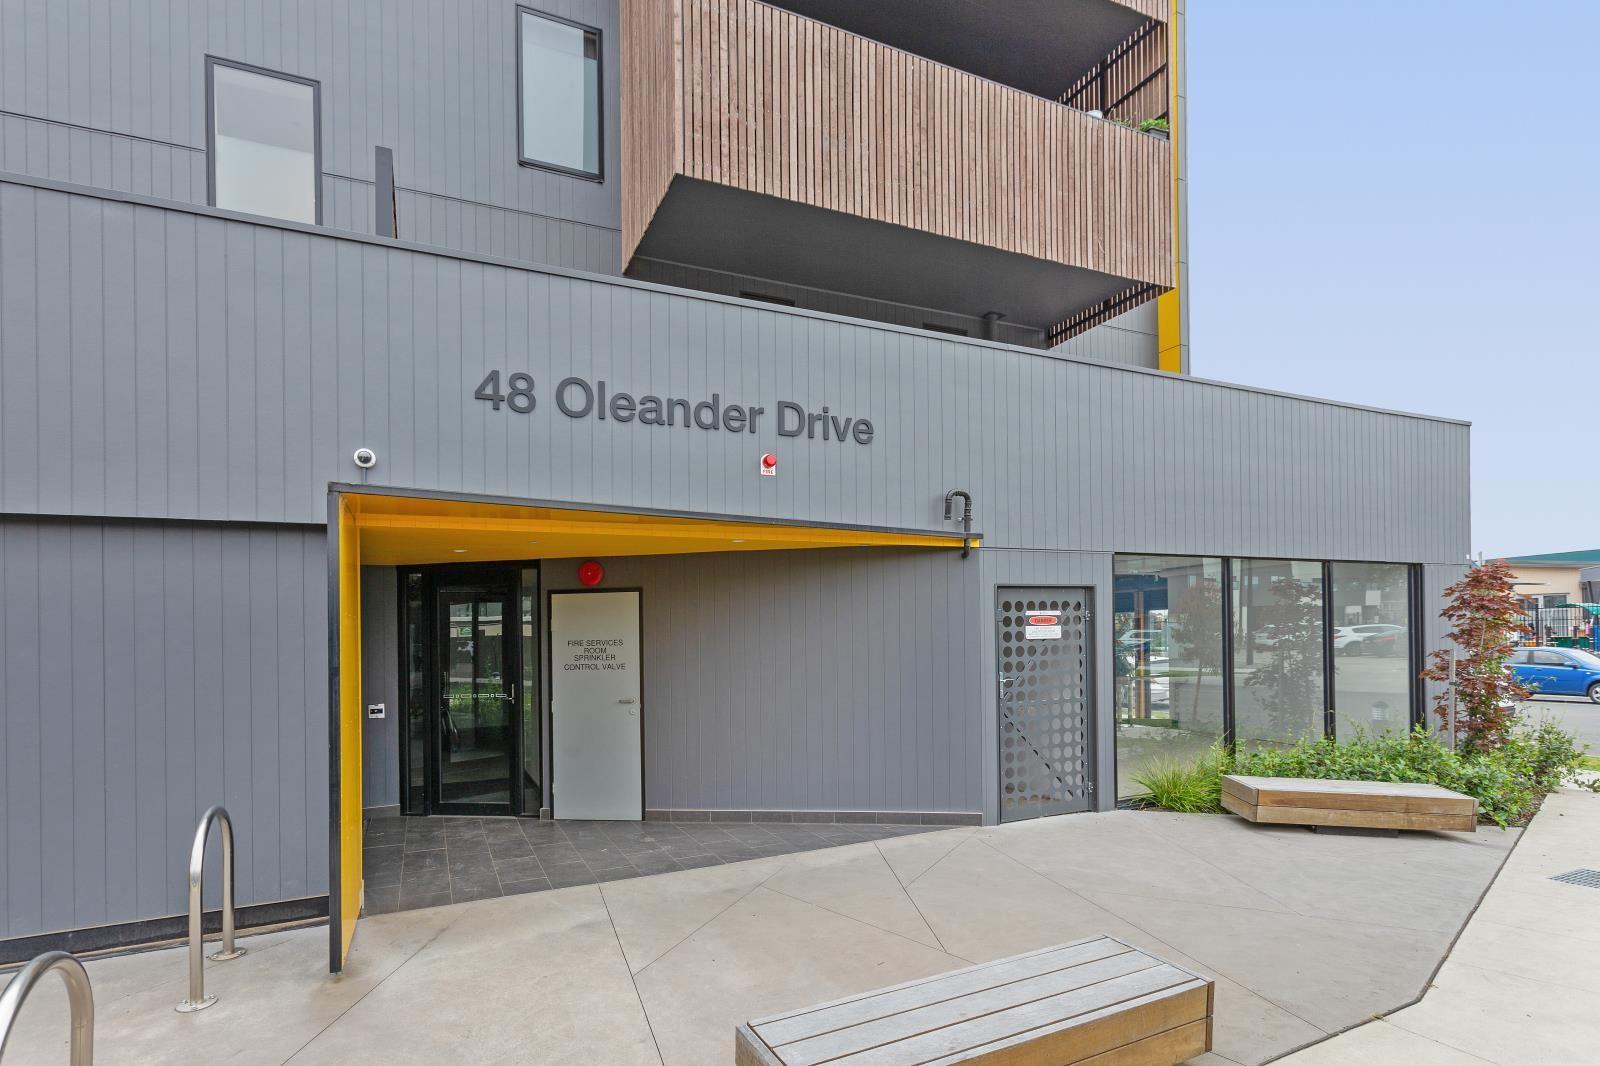 311/48 Oleander Drive, Mill Park VIC 3082, Image 0